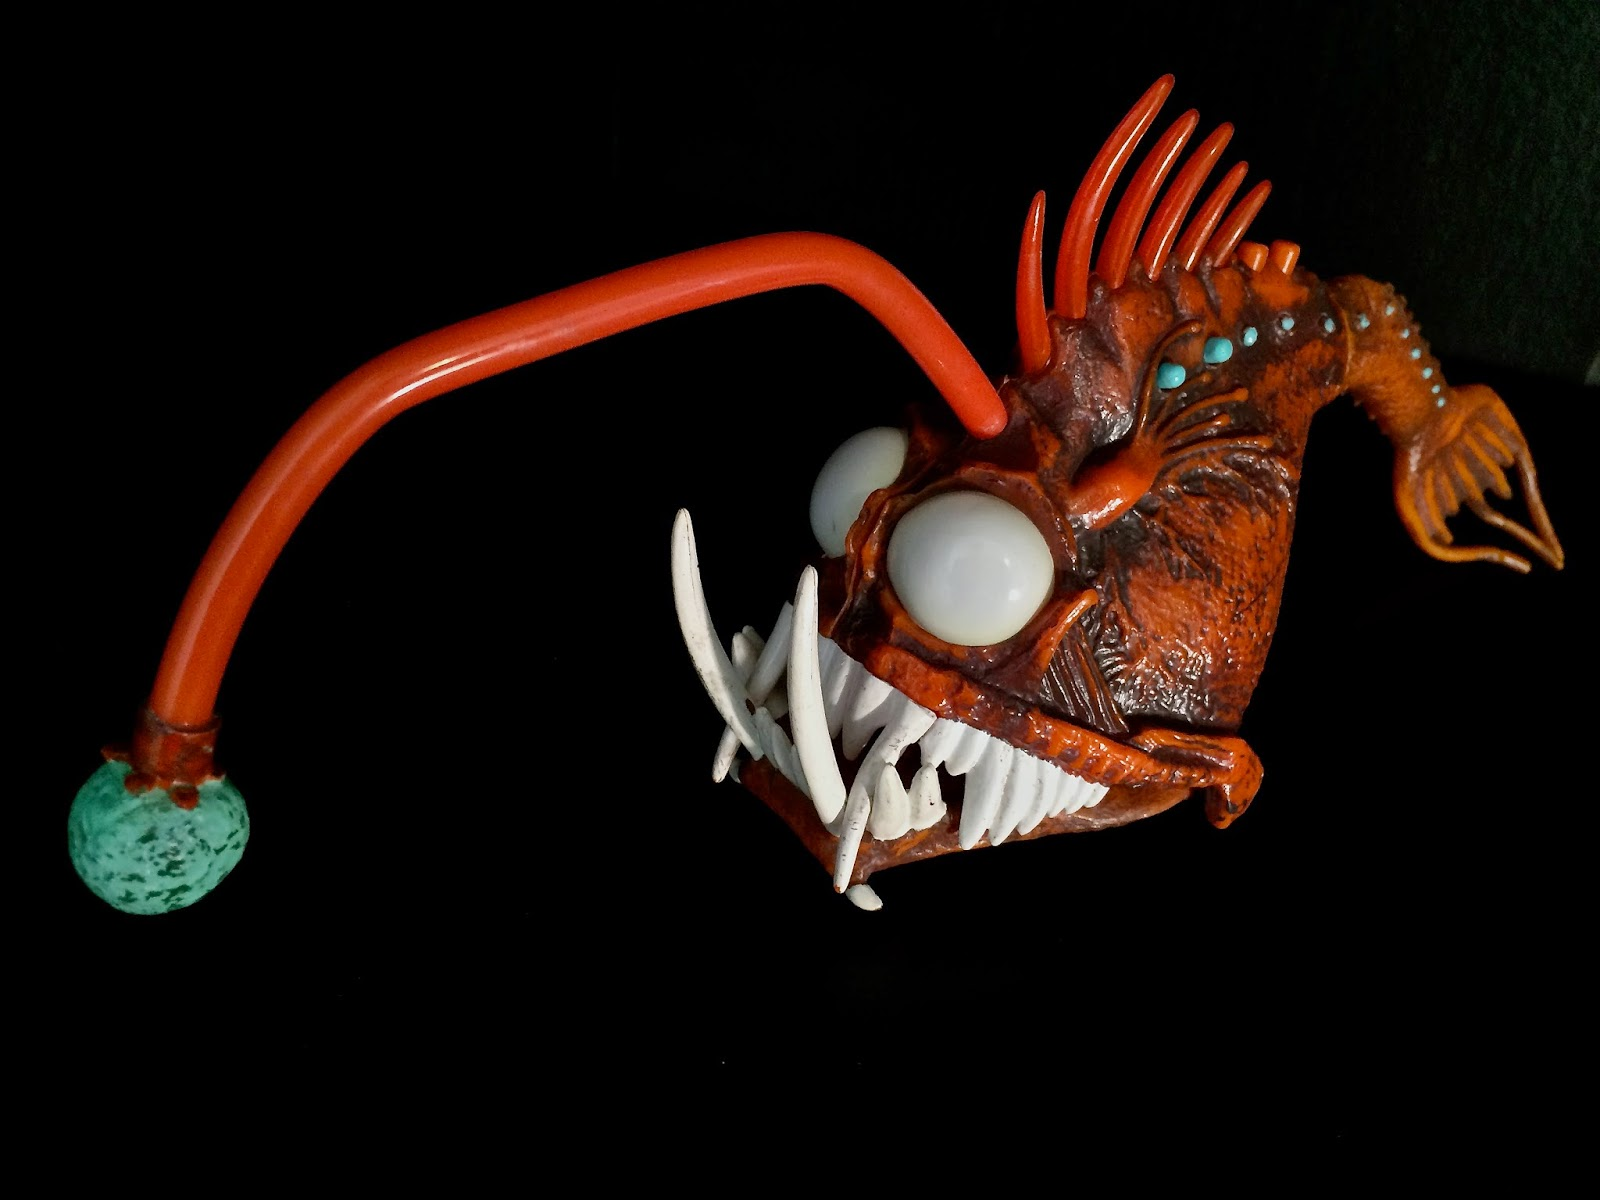 Dan the pixar fan finding nemo anglerfish light up for Angler fish light